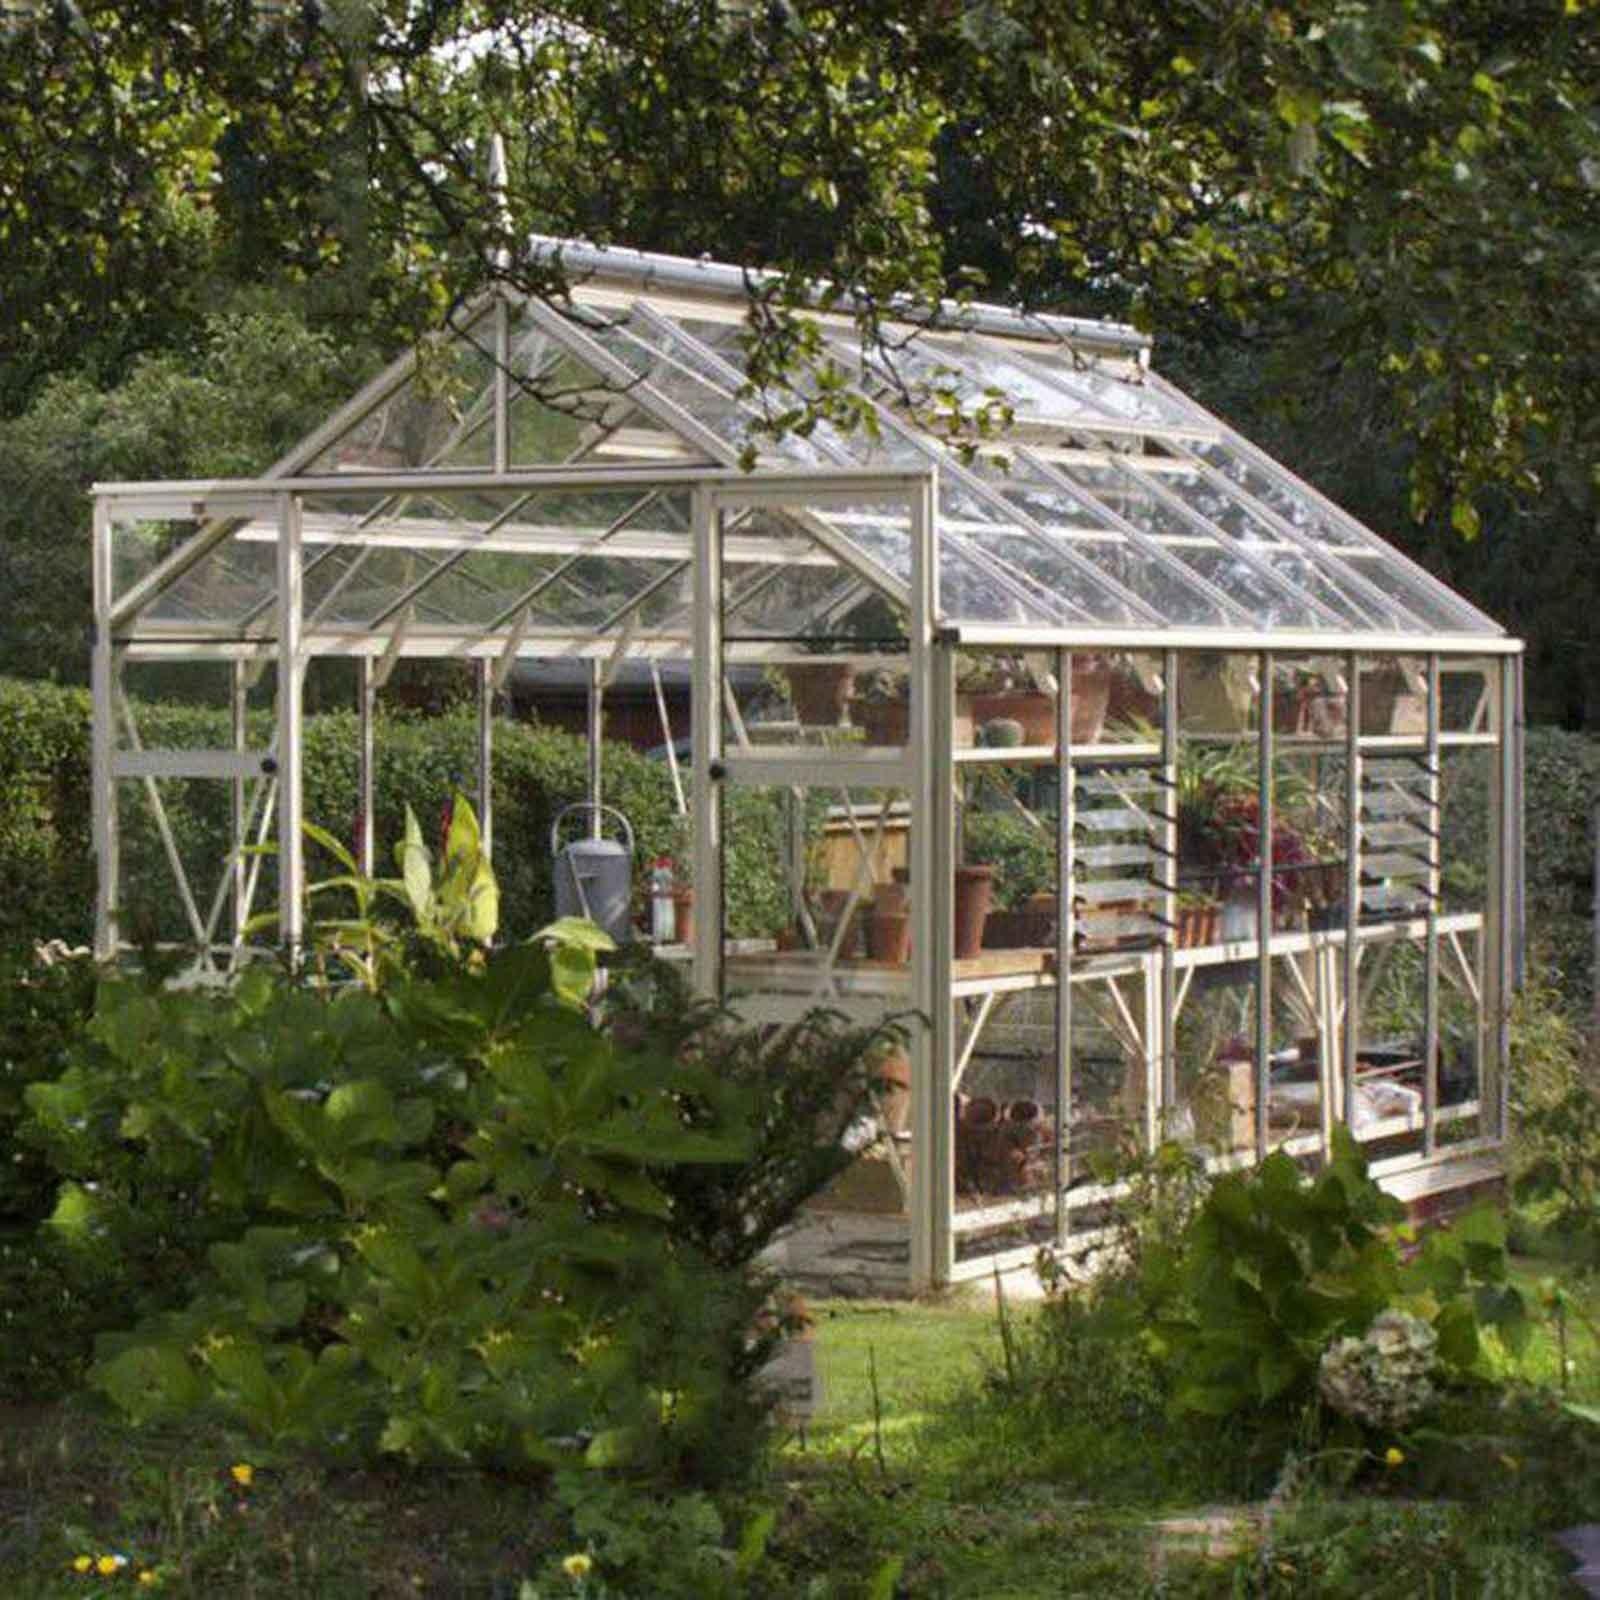 Shade Vegetable Garden Raised Beds